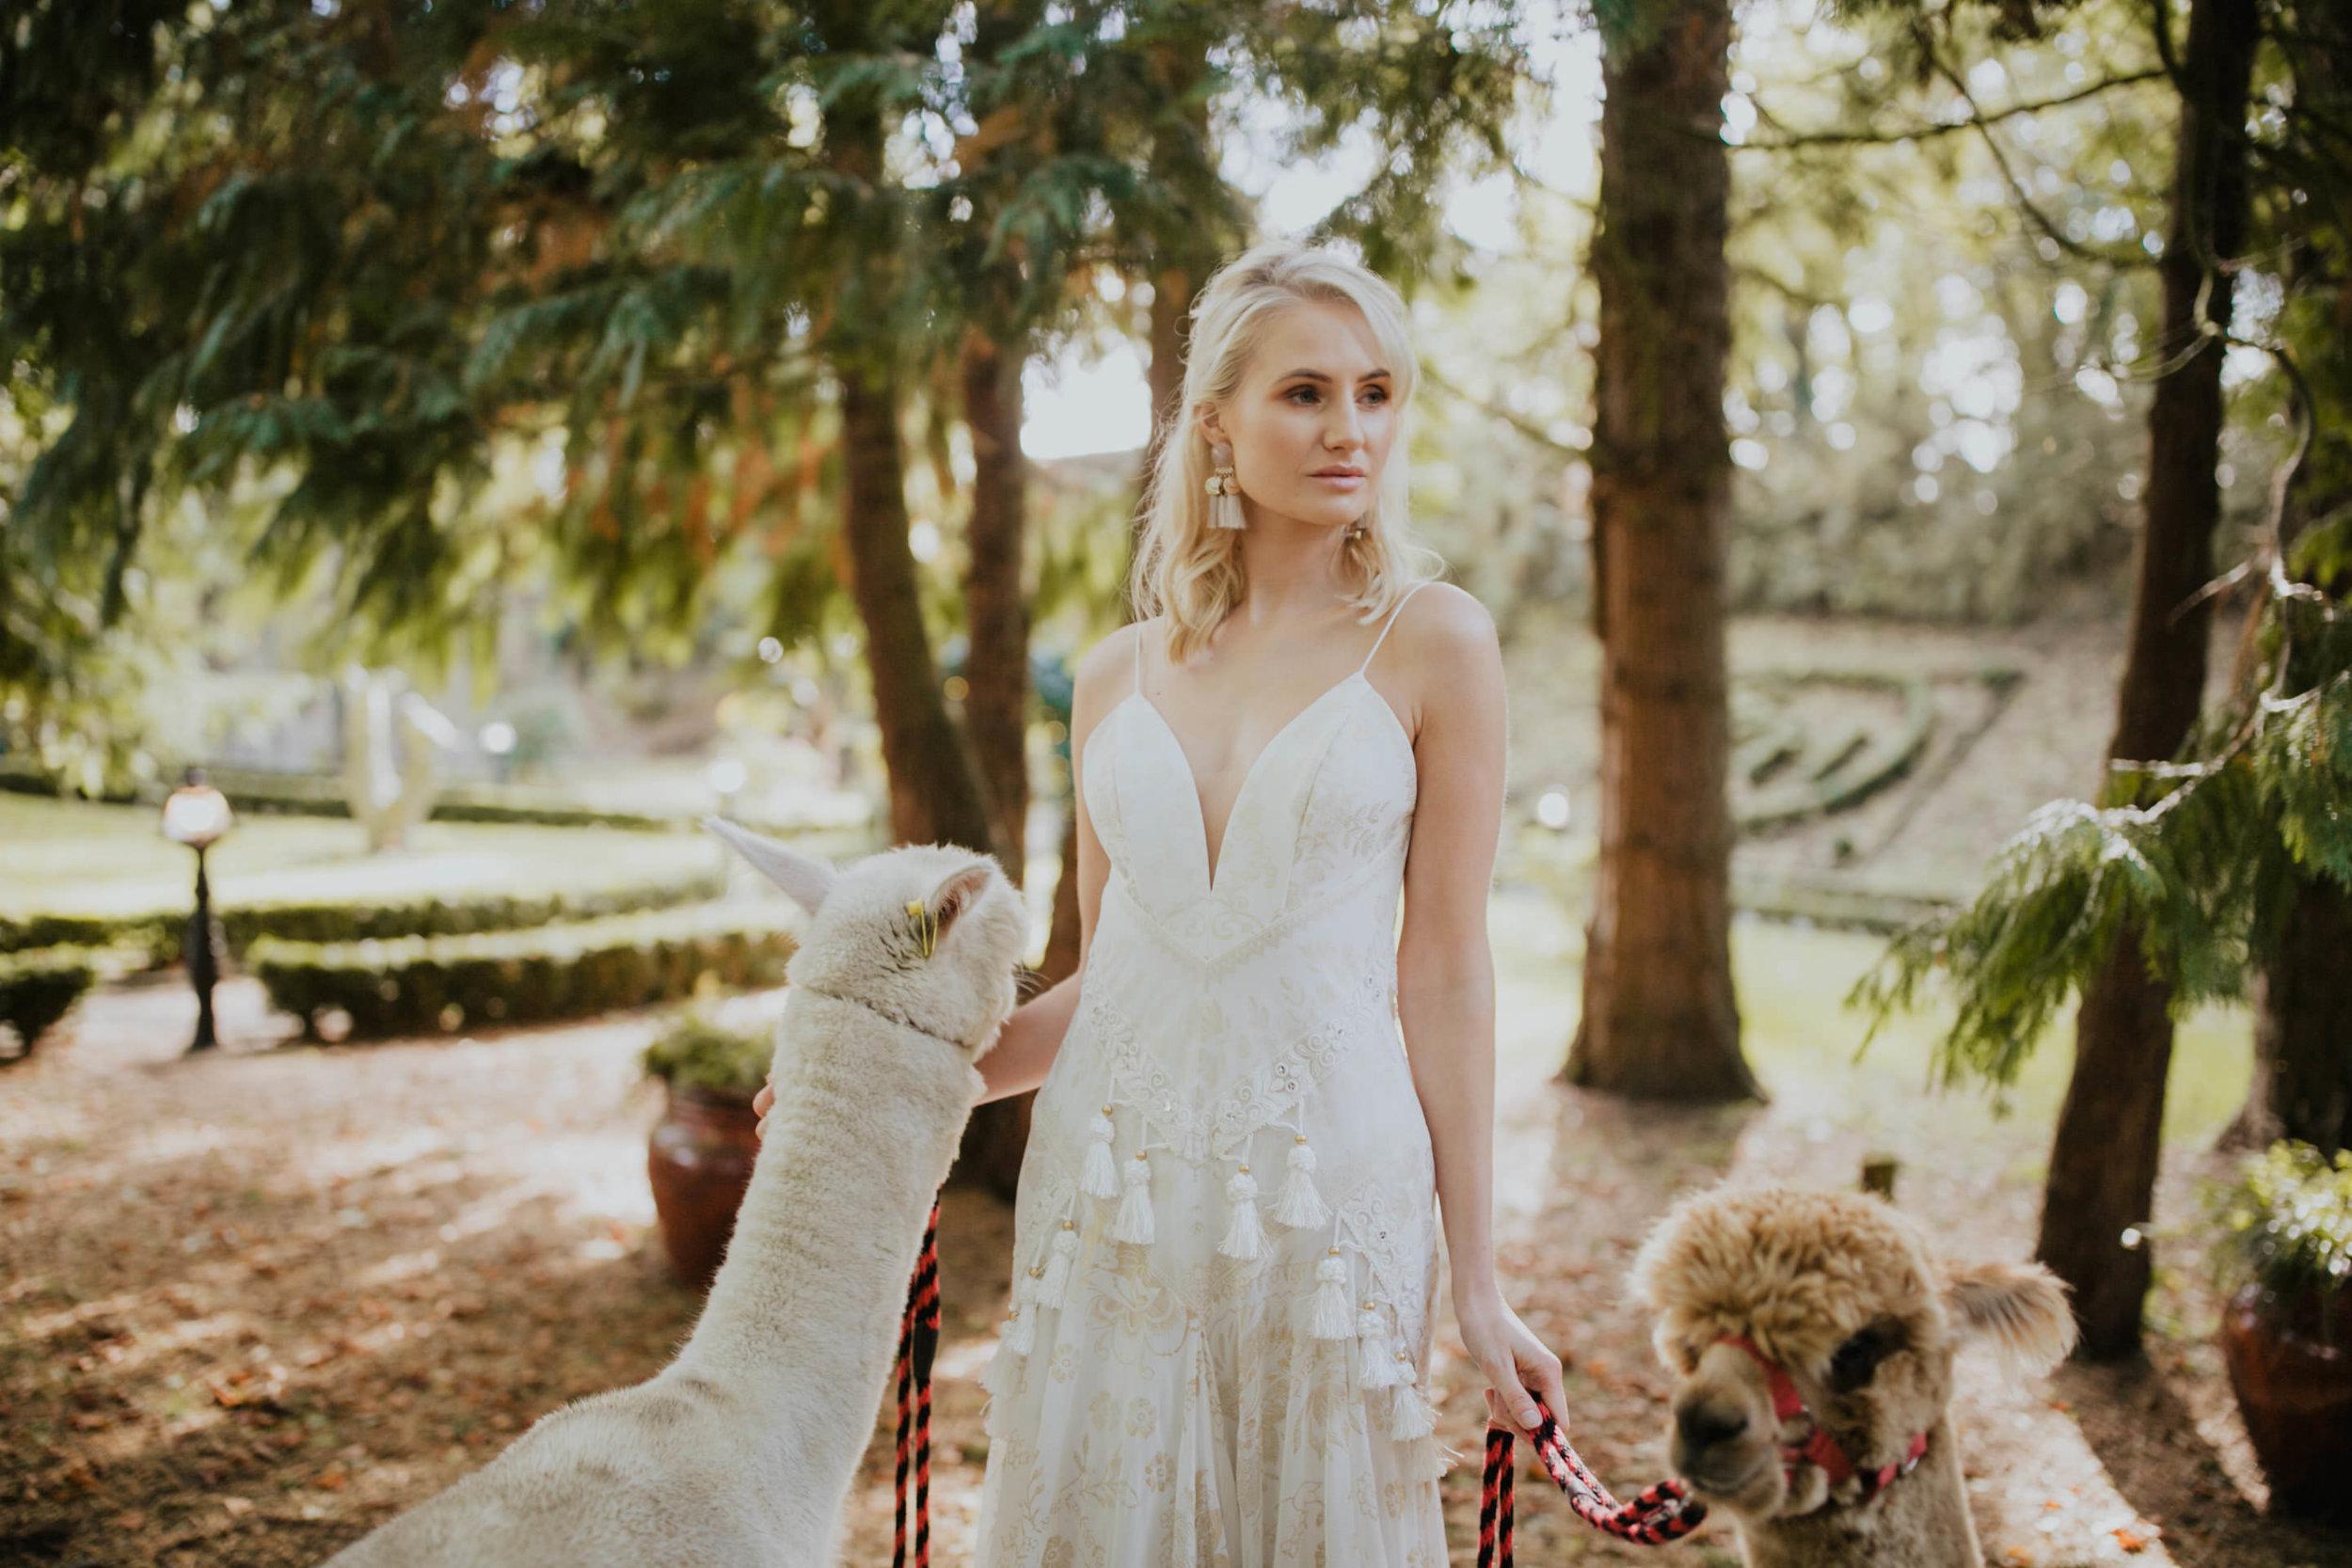 boho_wedding_alpaca_xpose_station_house_livia_figueiredo_photography_20.jpg